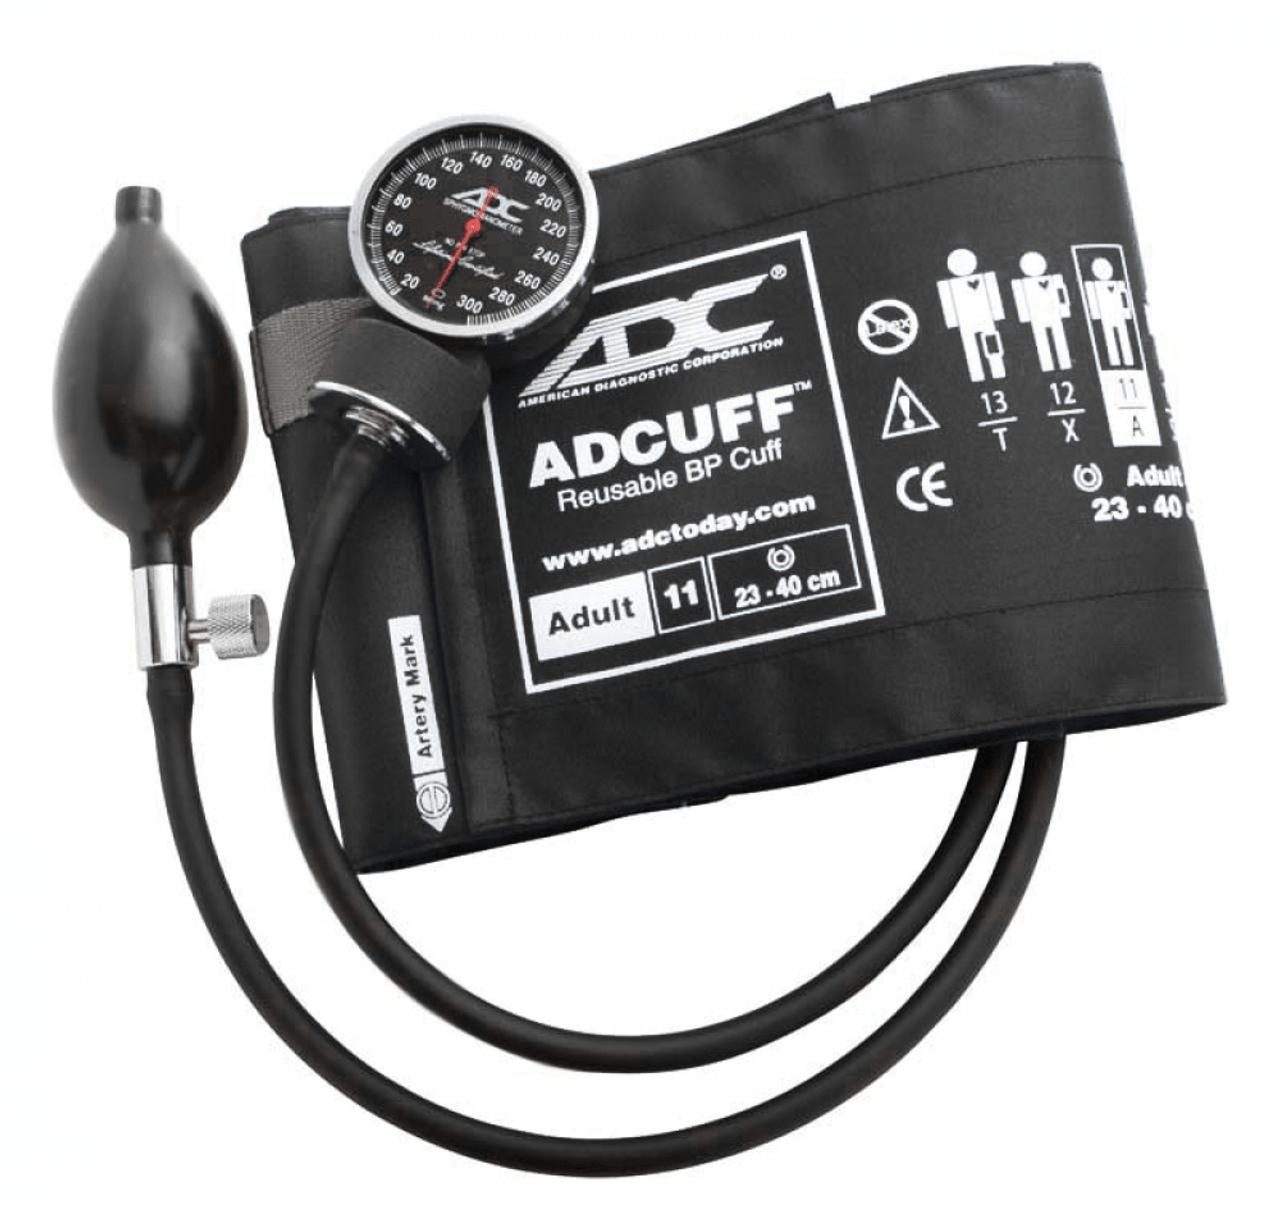 ADC 720 Diagnostix Pocket Aneroid Sphygmomanometer, Adult Cuff, 720-11ABK